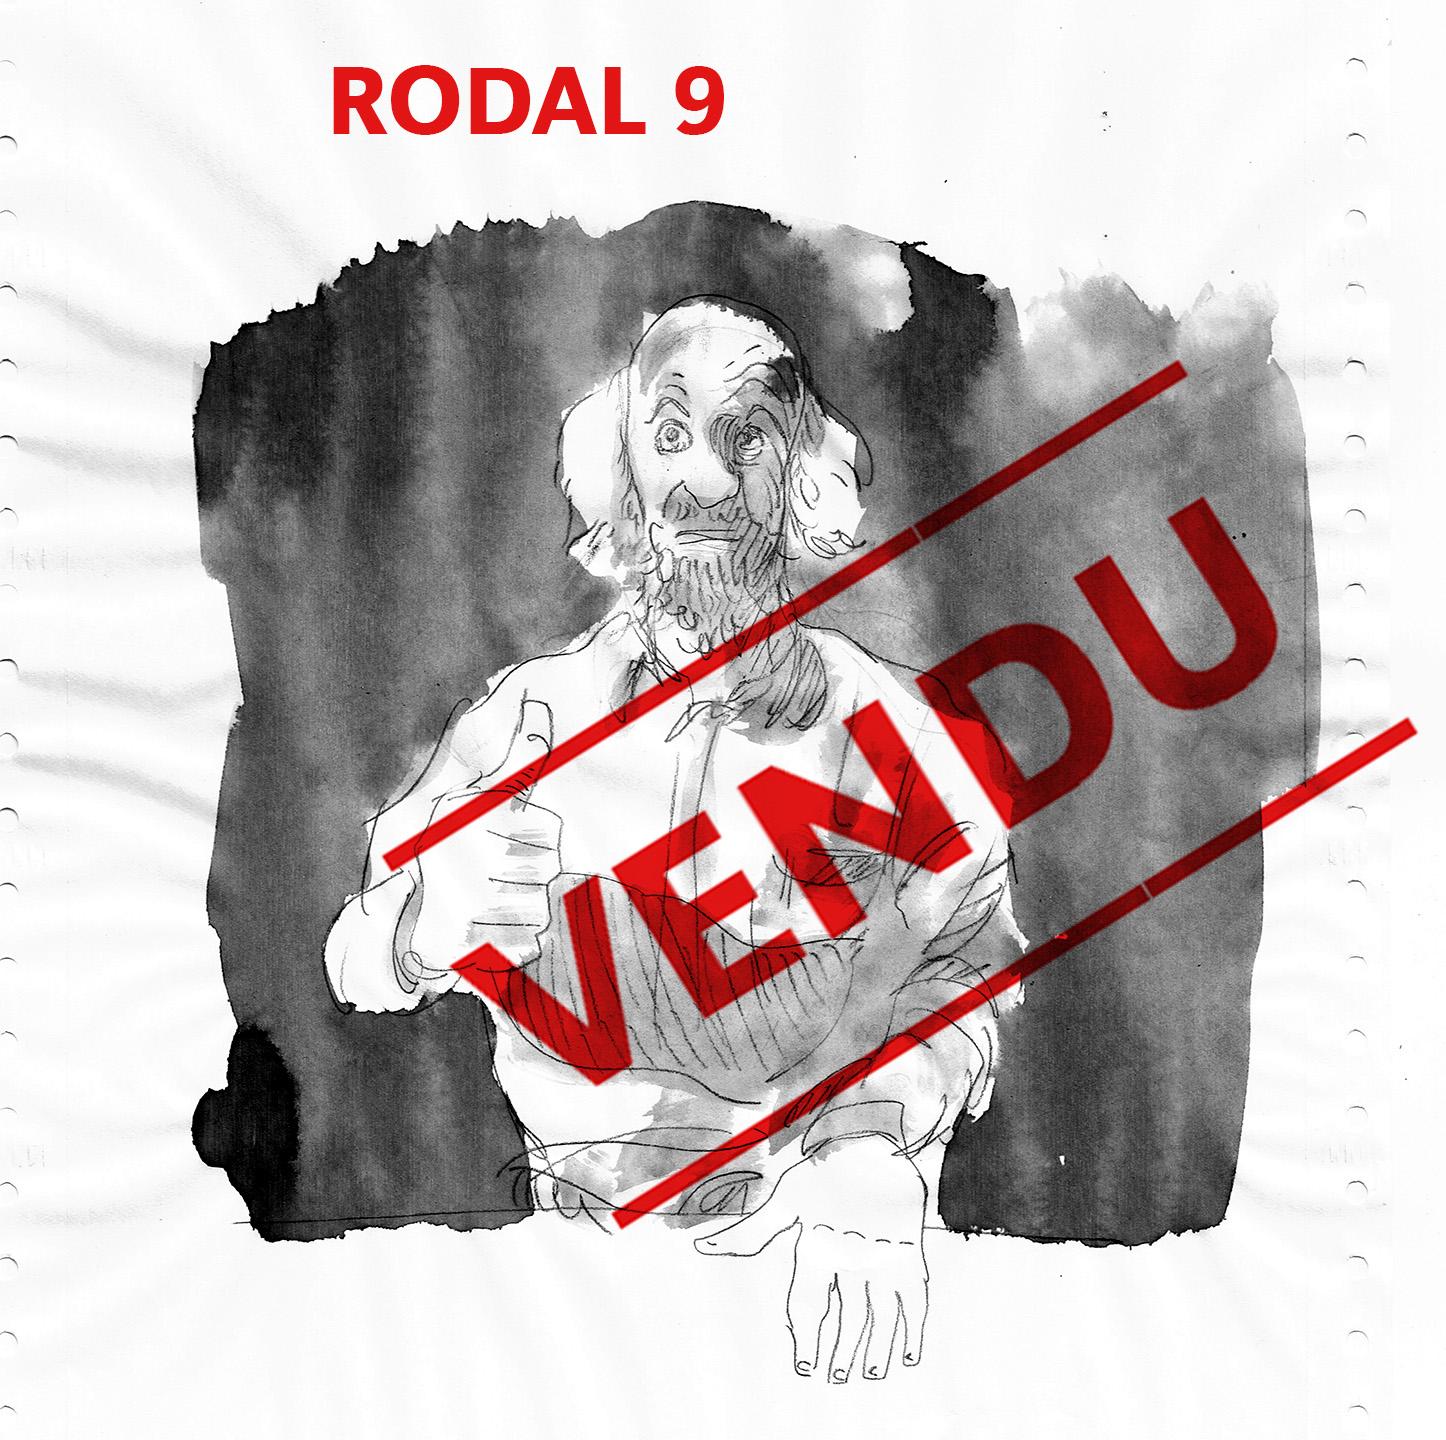 rodal_9